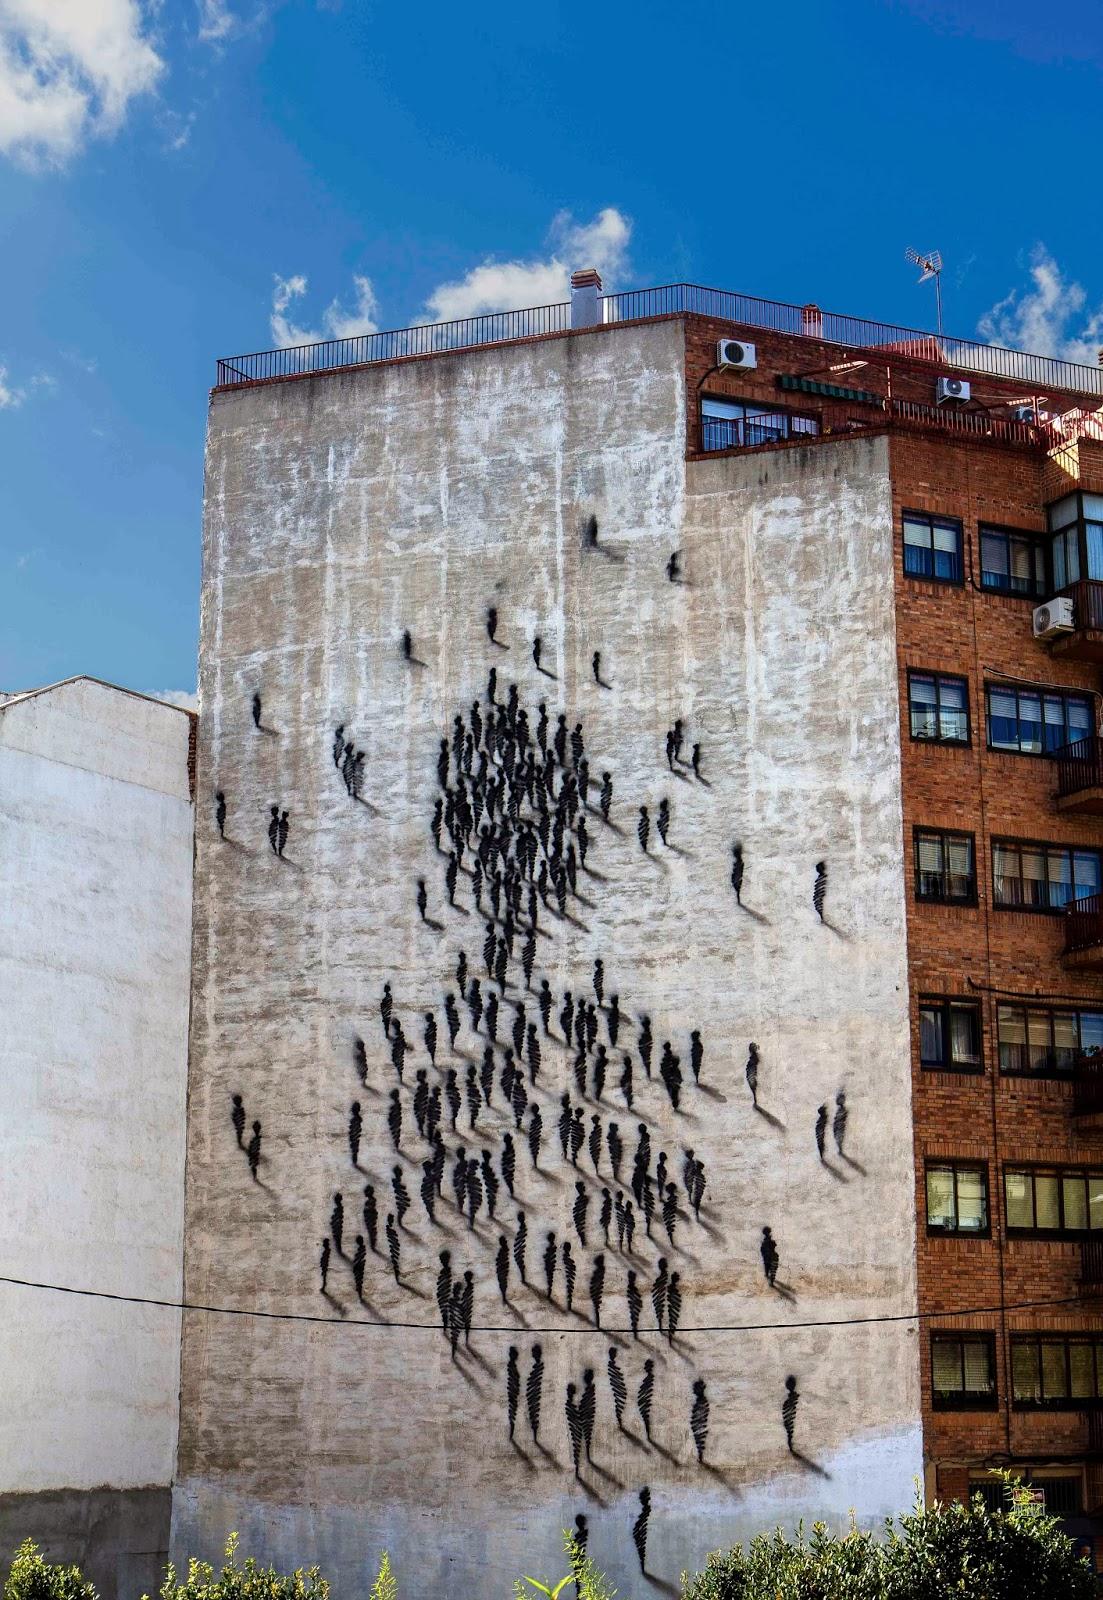 Street Art by Suso33 in Madrid, Spain 5